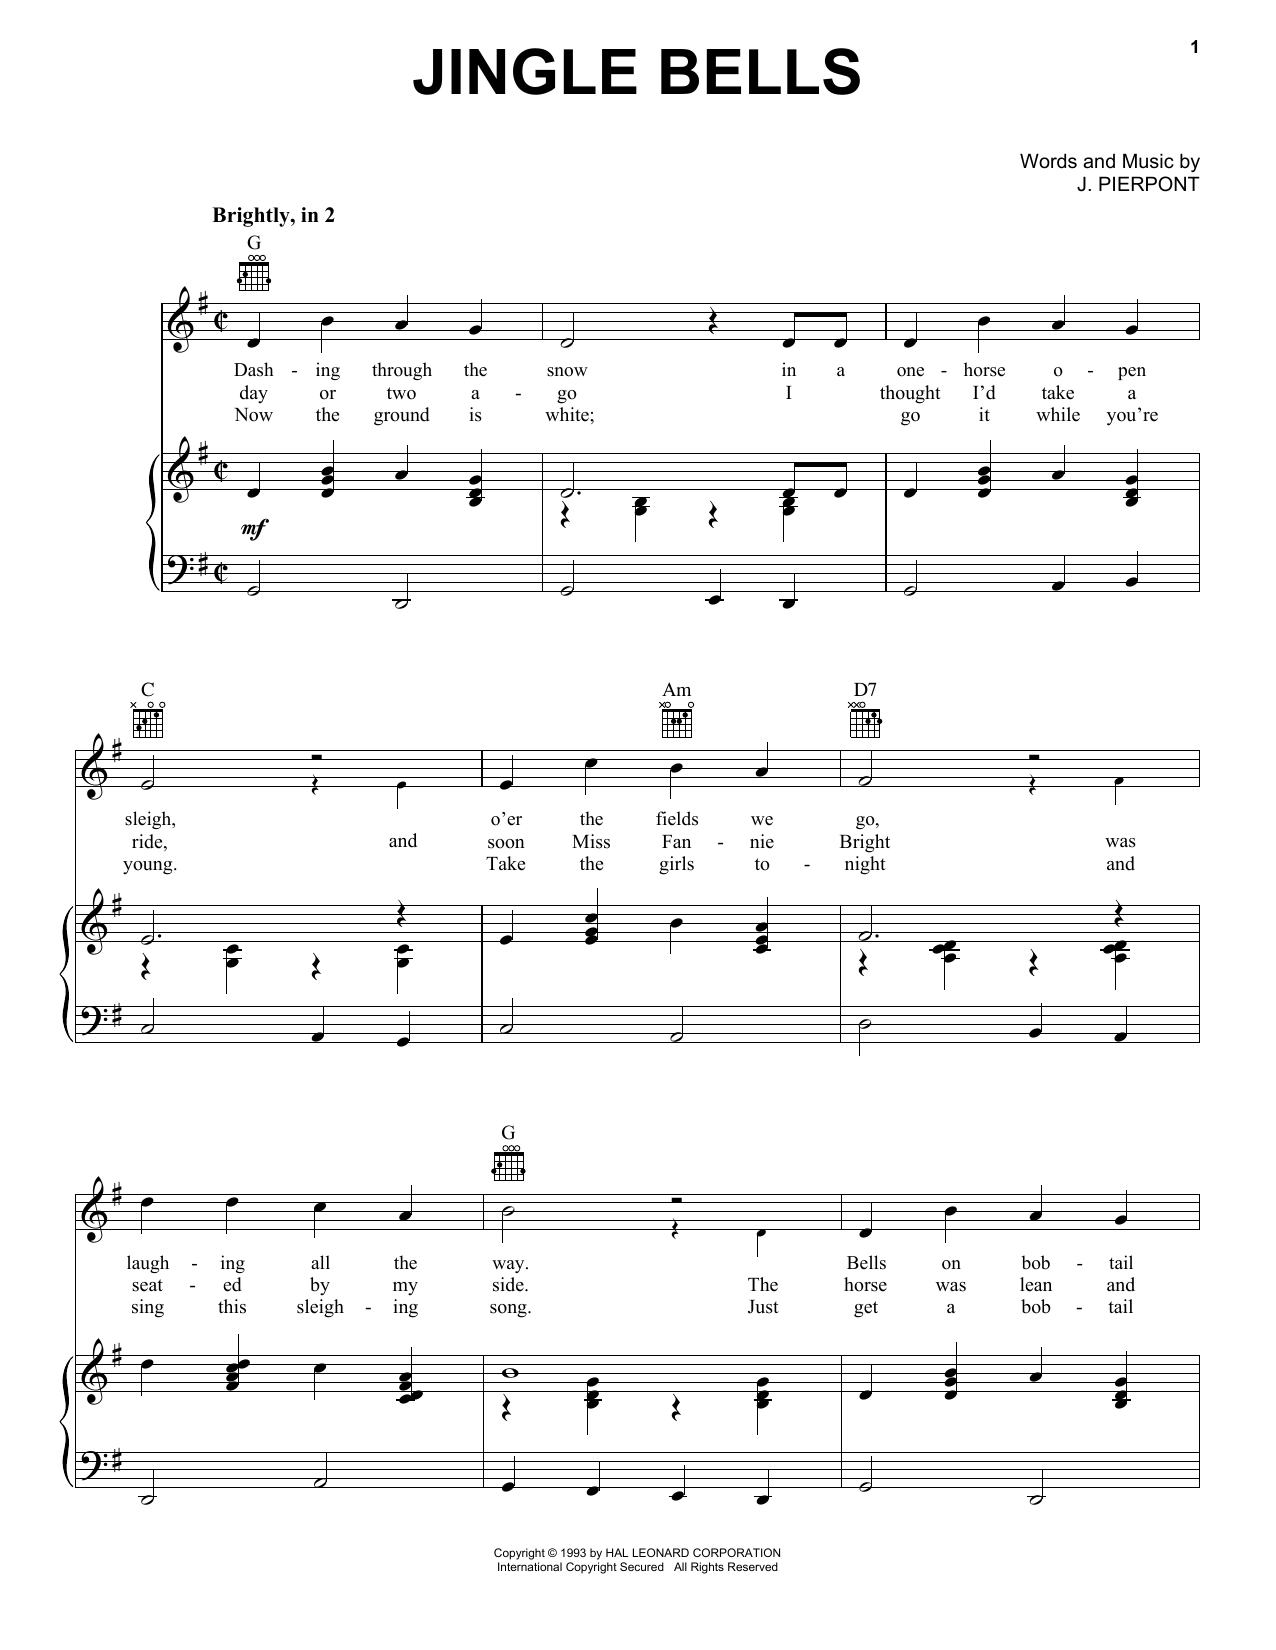 J Pierpont Jingle Bells Sheet Music Notes Chords Download Printable Piano Vocal Guitar Right Hand Melody Sku 16561